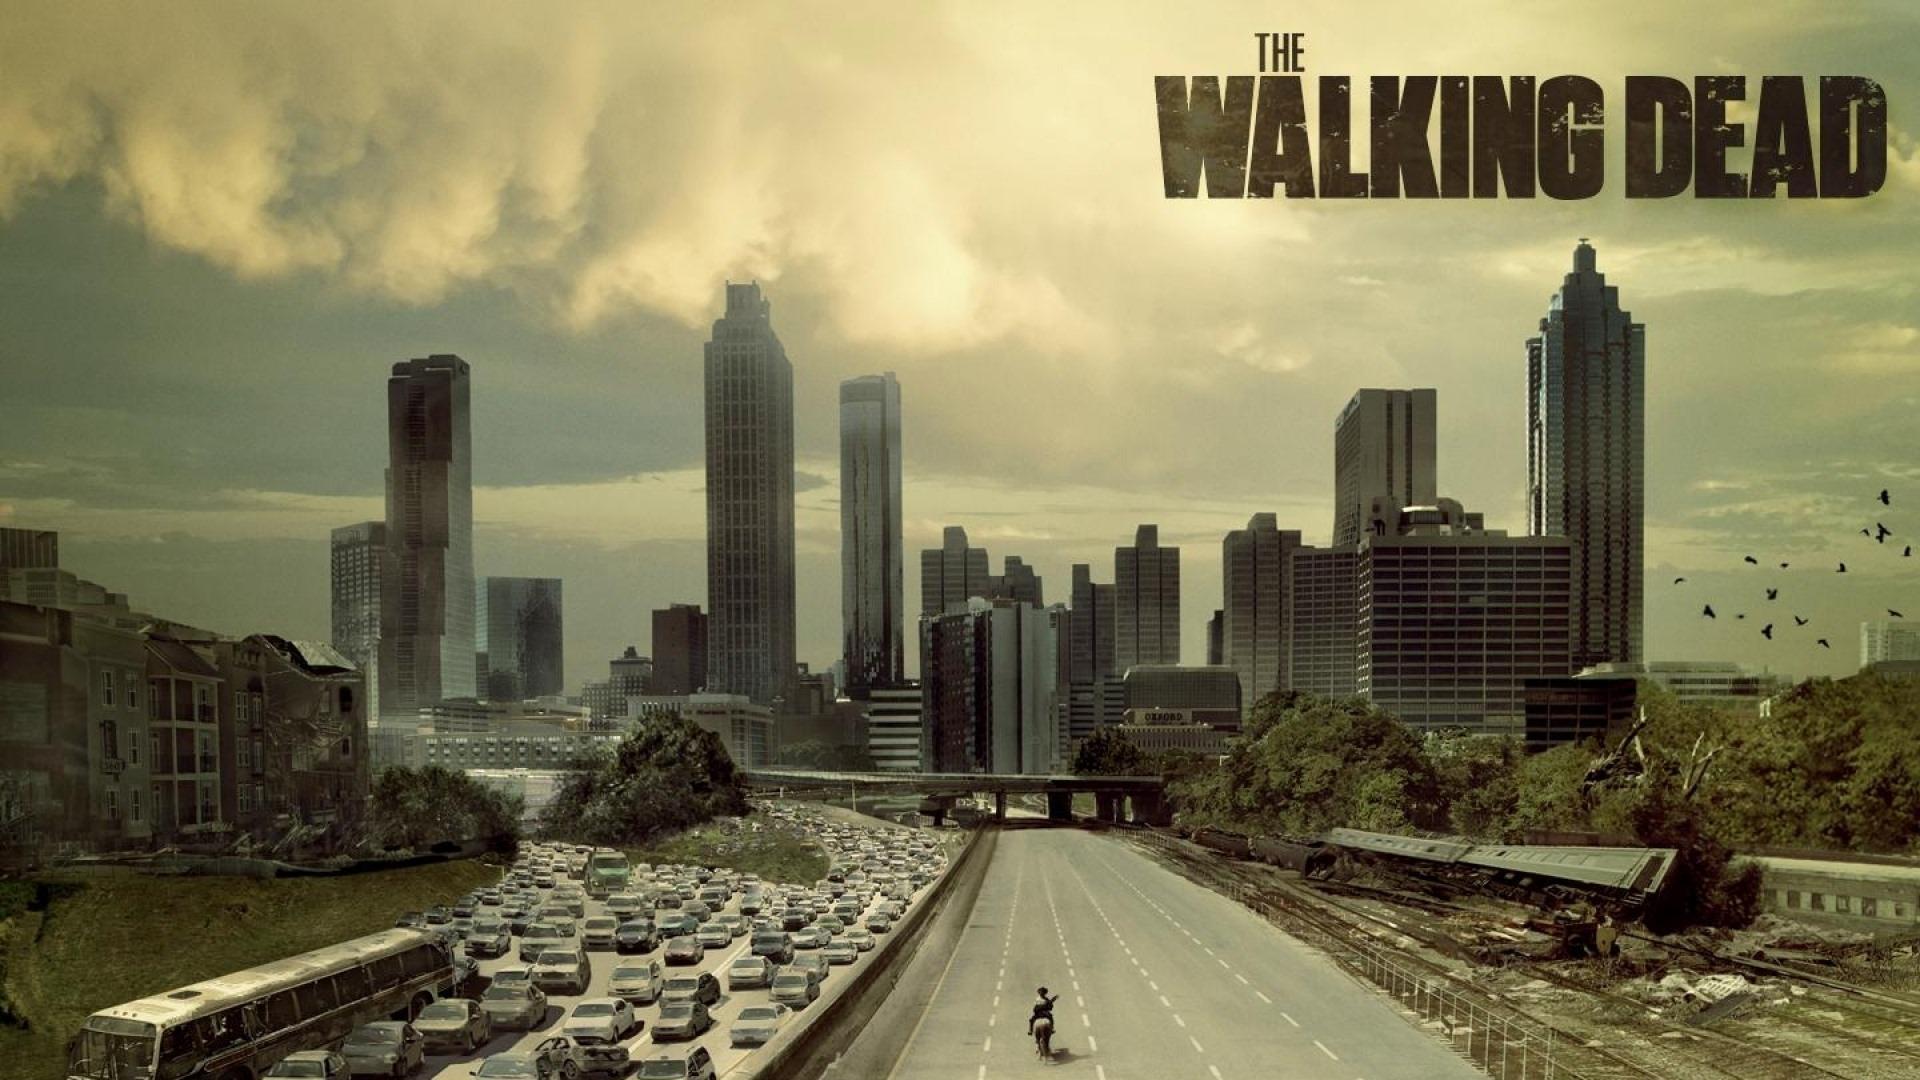 Walking Dead Season 8 Wallpaper Posted By Christopher Johnson